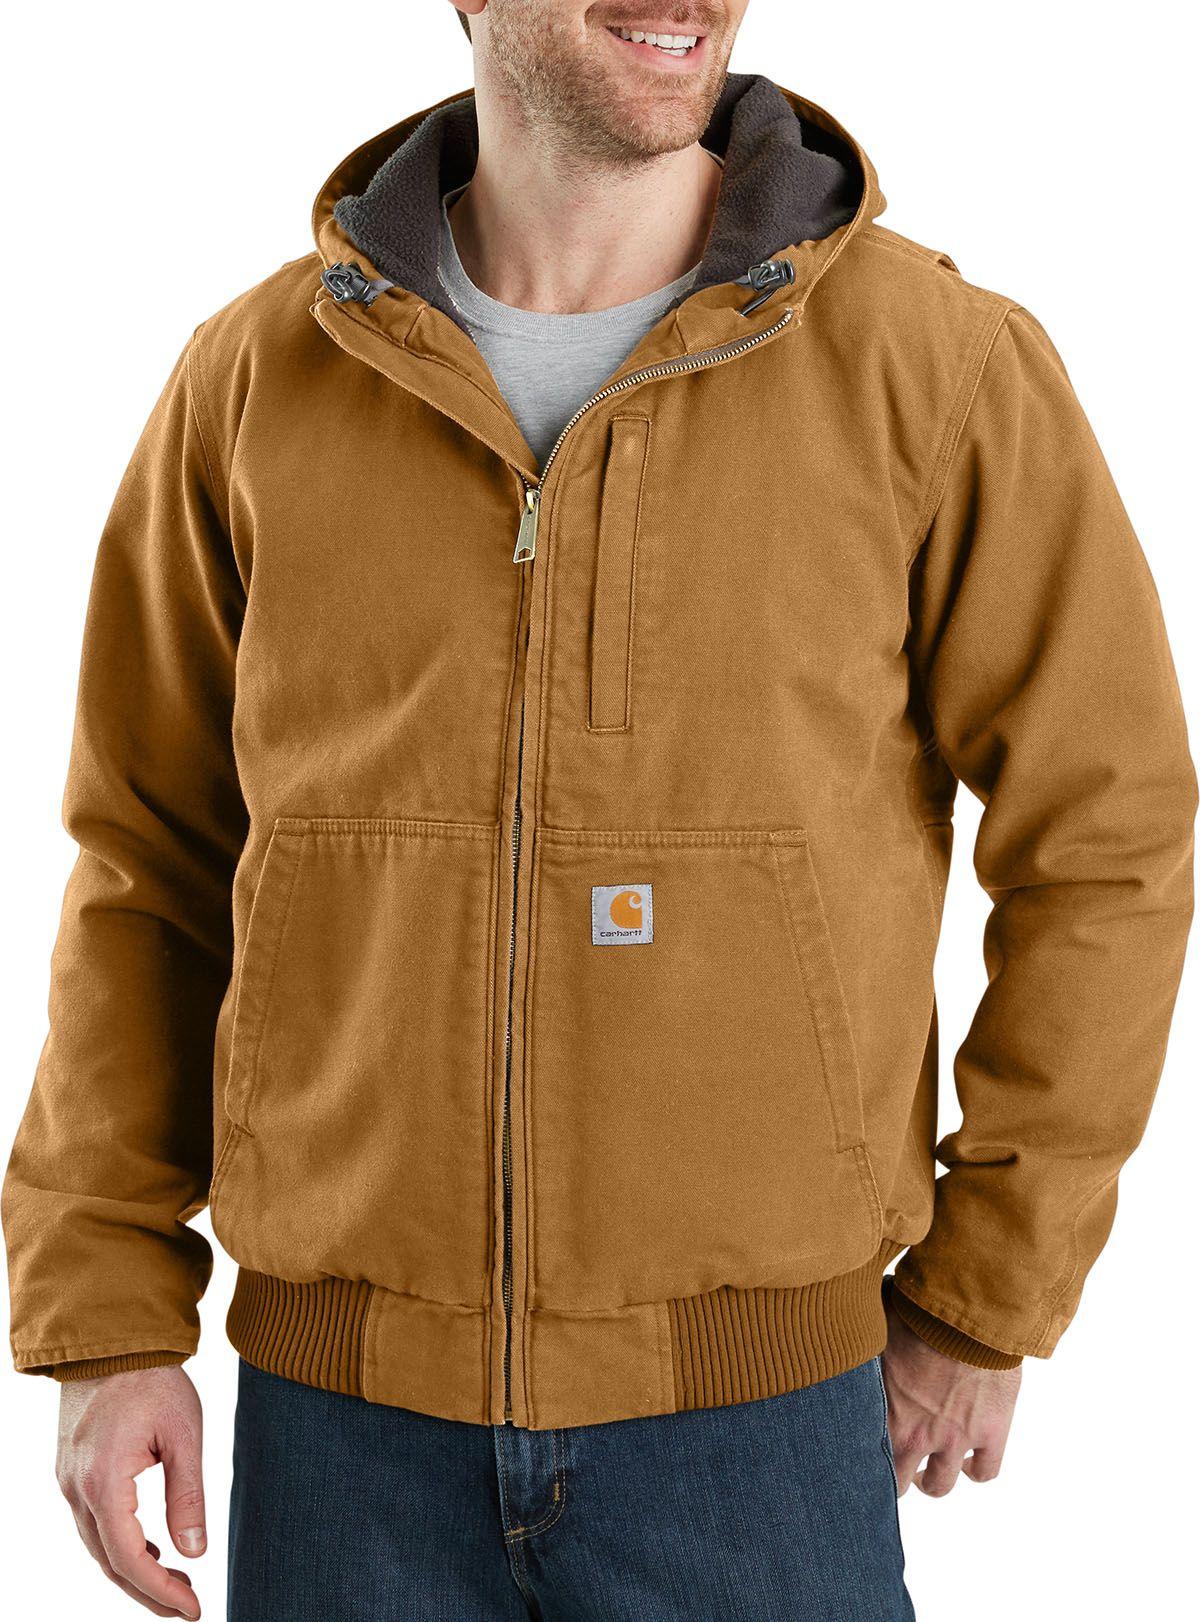 Carhartt jacket brown